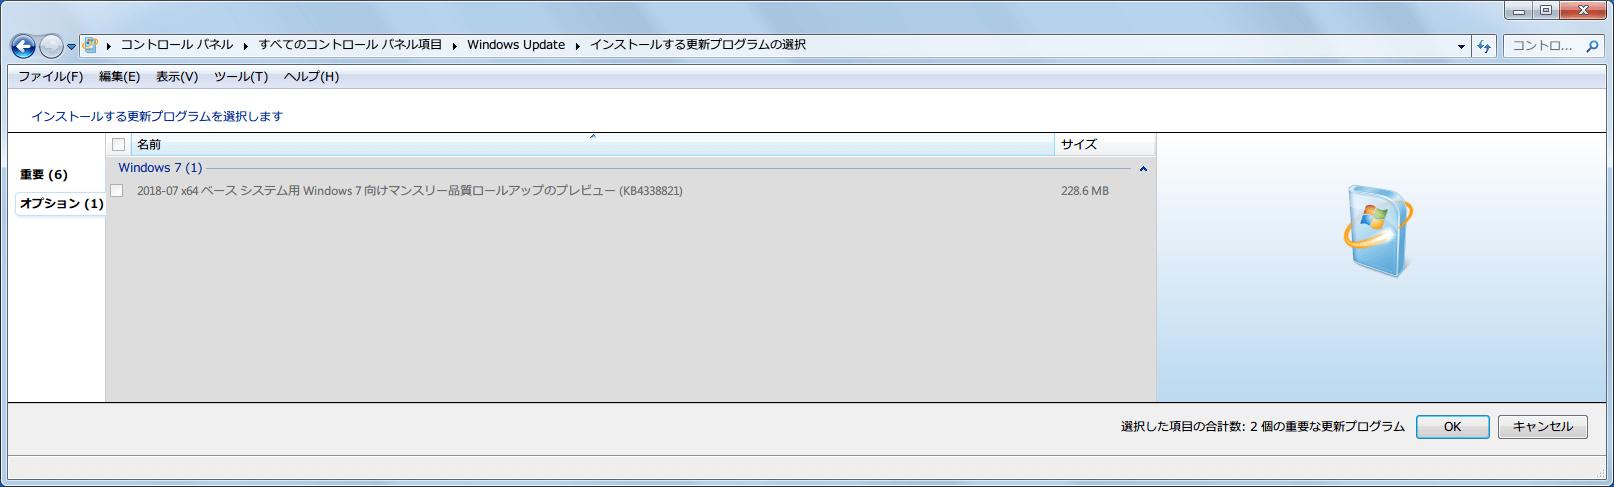 Windows 7 64bit Windows Update オプション 2018年7月分リスト KB4291493 KB4284842 非表示